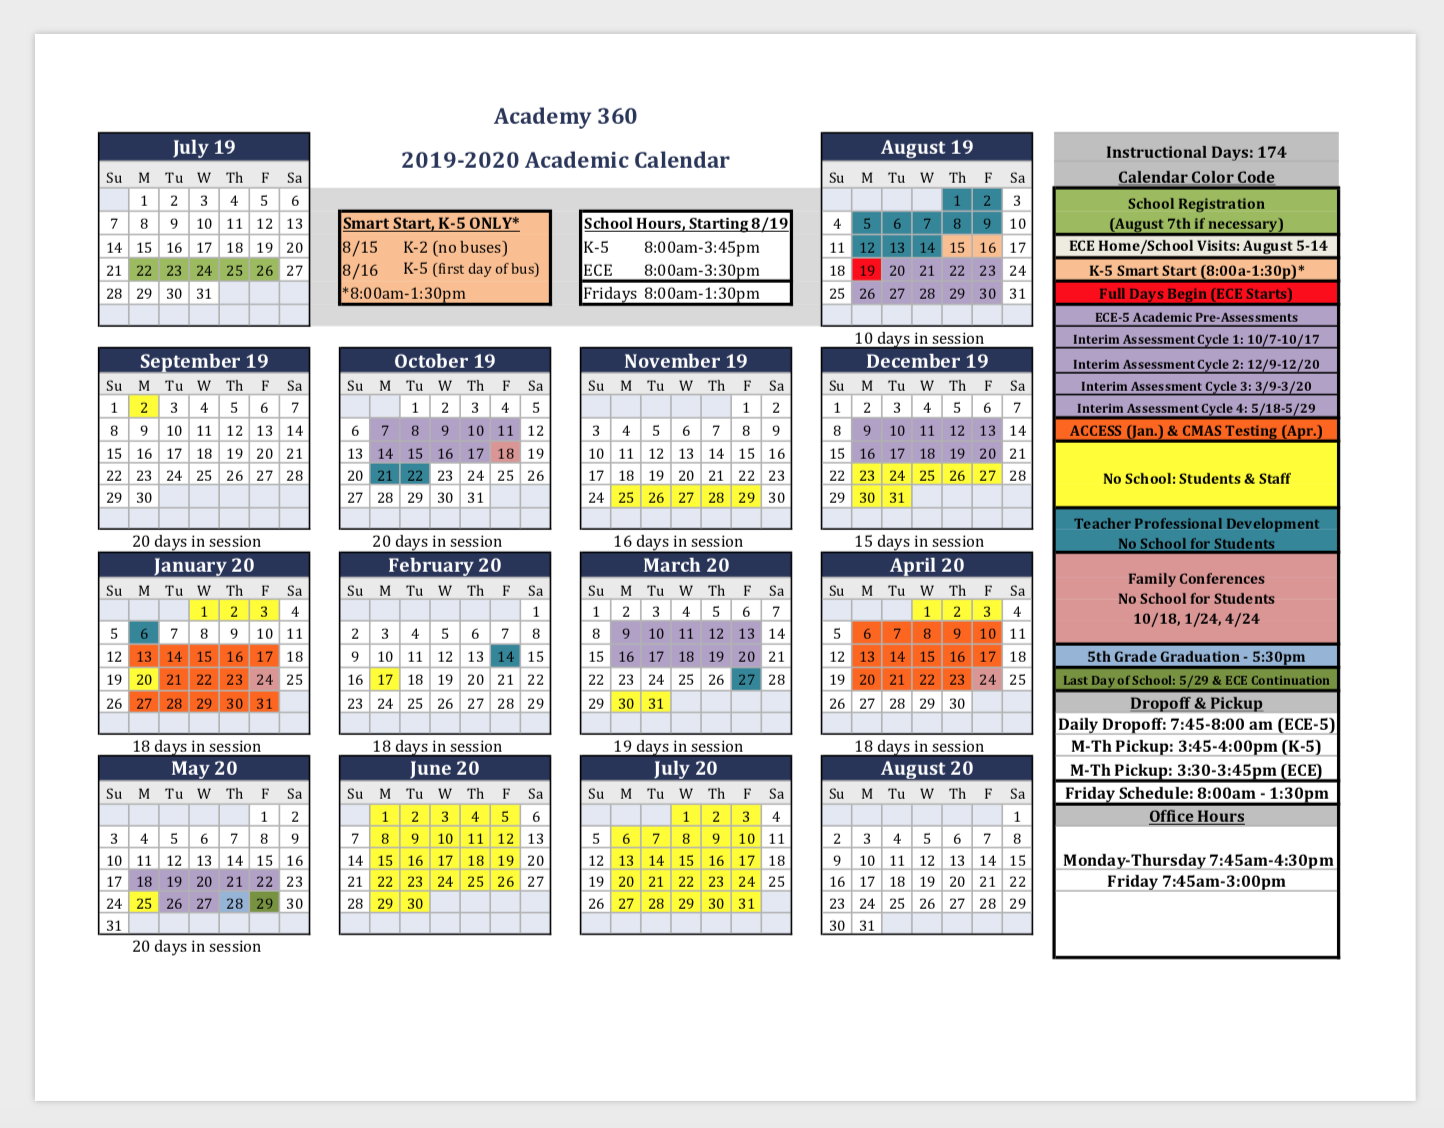 Colorado School Of Mines Academic Calendar Inside Gsu Academic Calendar 2021 2020